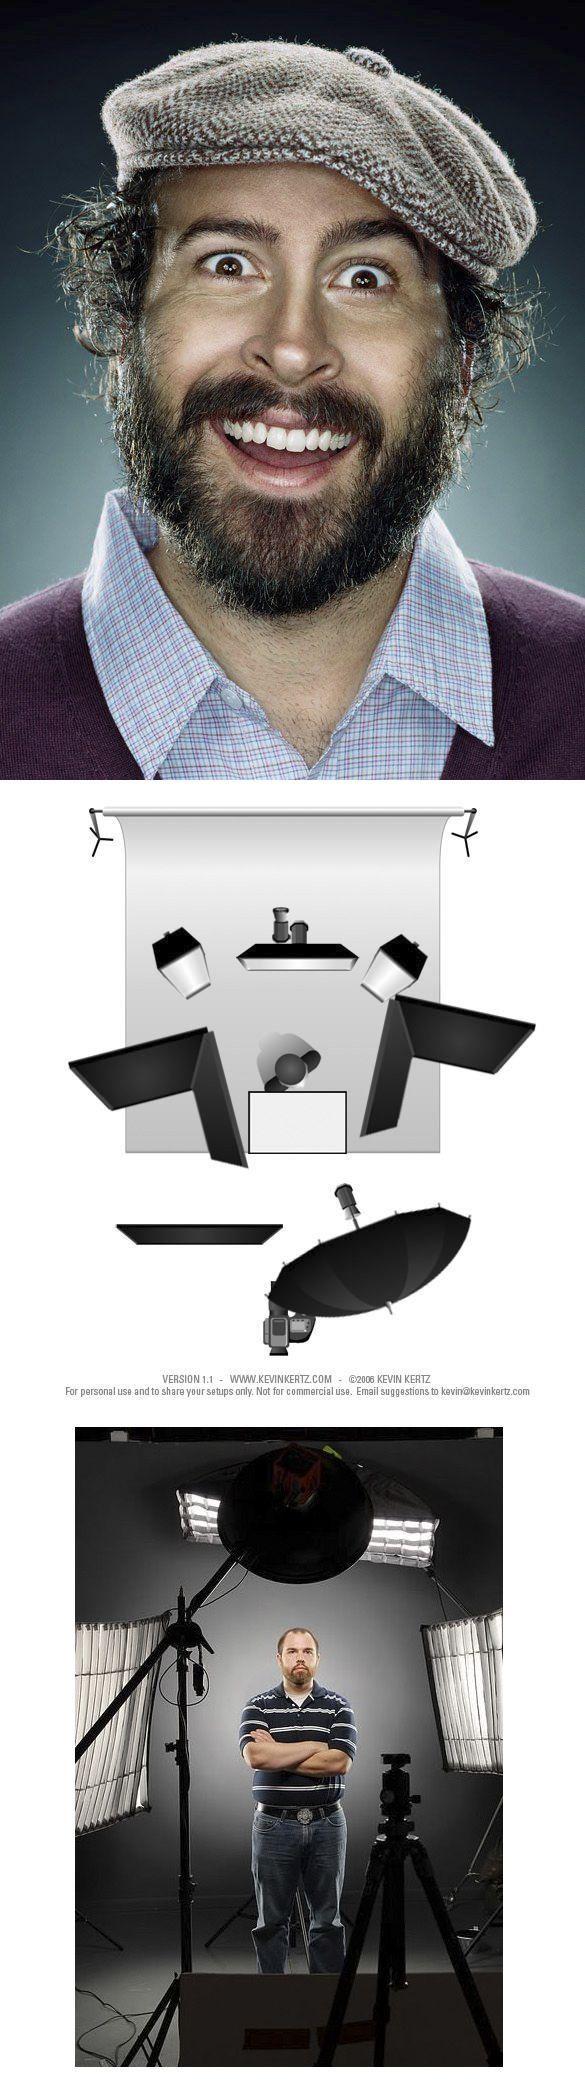 Frontal, Rim, and Background Lighting Setup